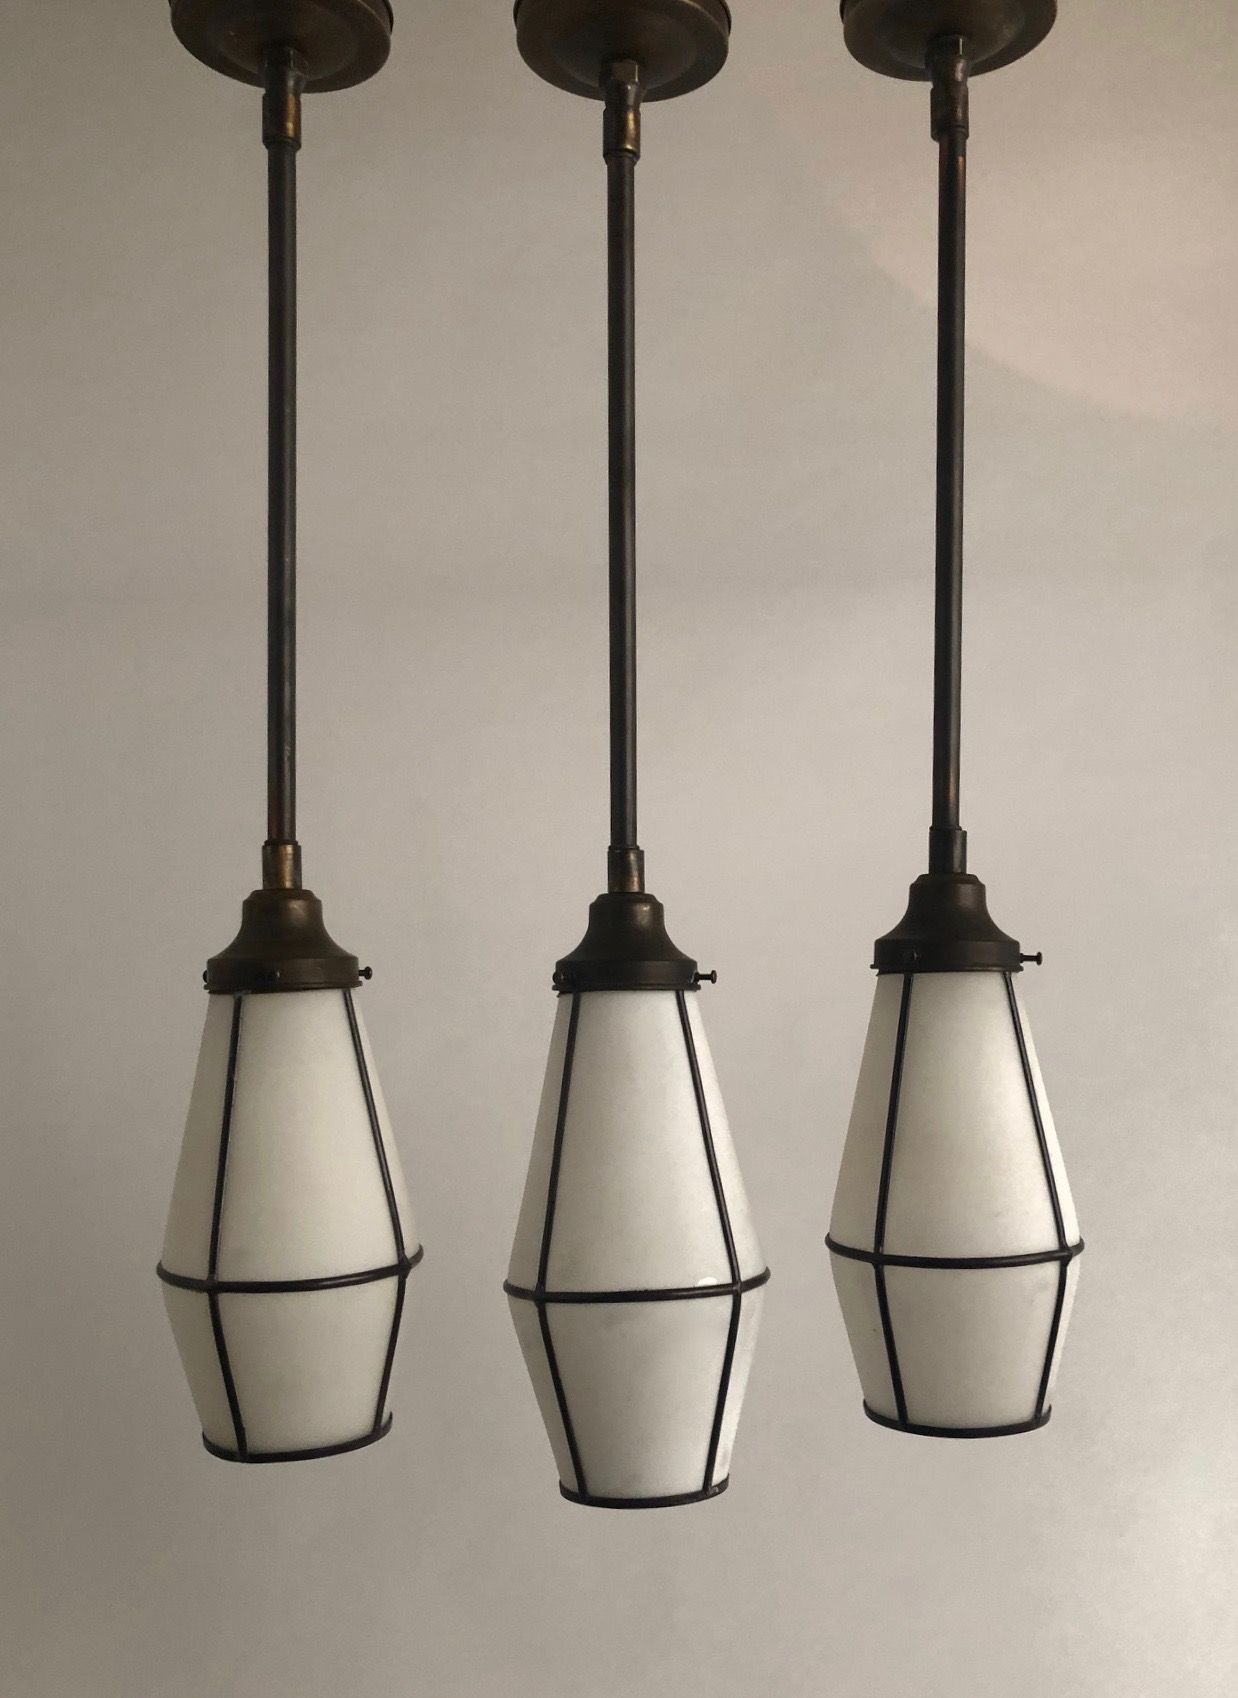 Edwardian Arts And Crafts Brass Five Branch Electrolier Ceiling Light In 2021 Ceiling Lights Edwardian Art Chandelier Pendant Lights